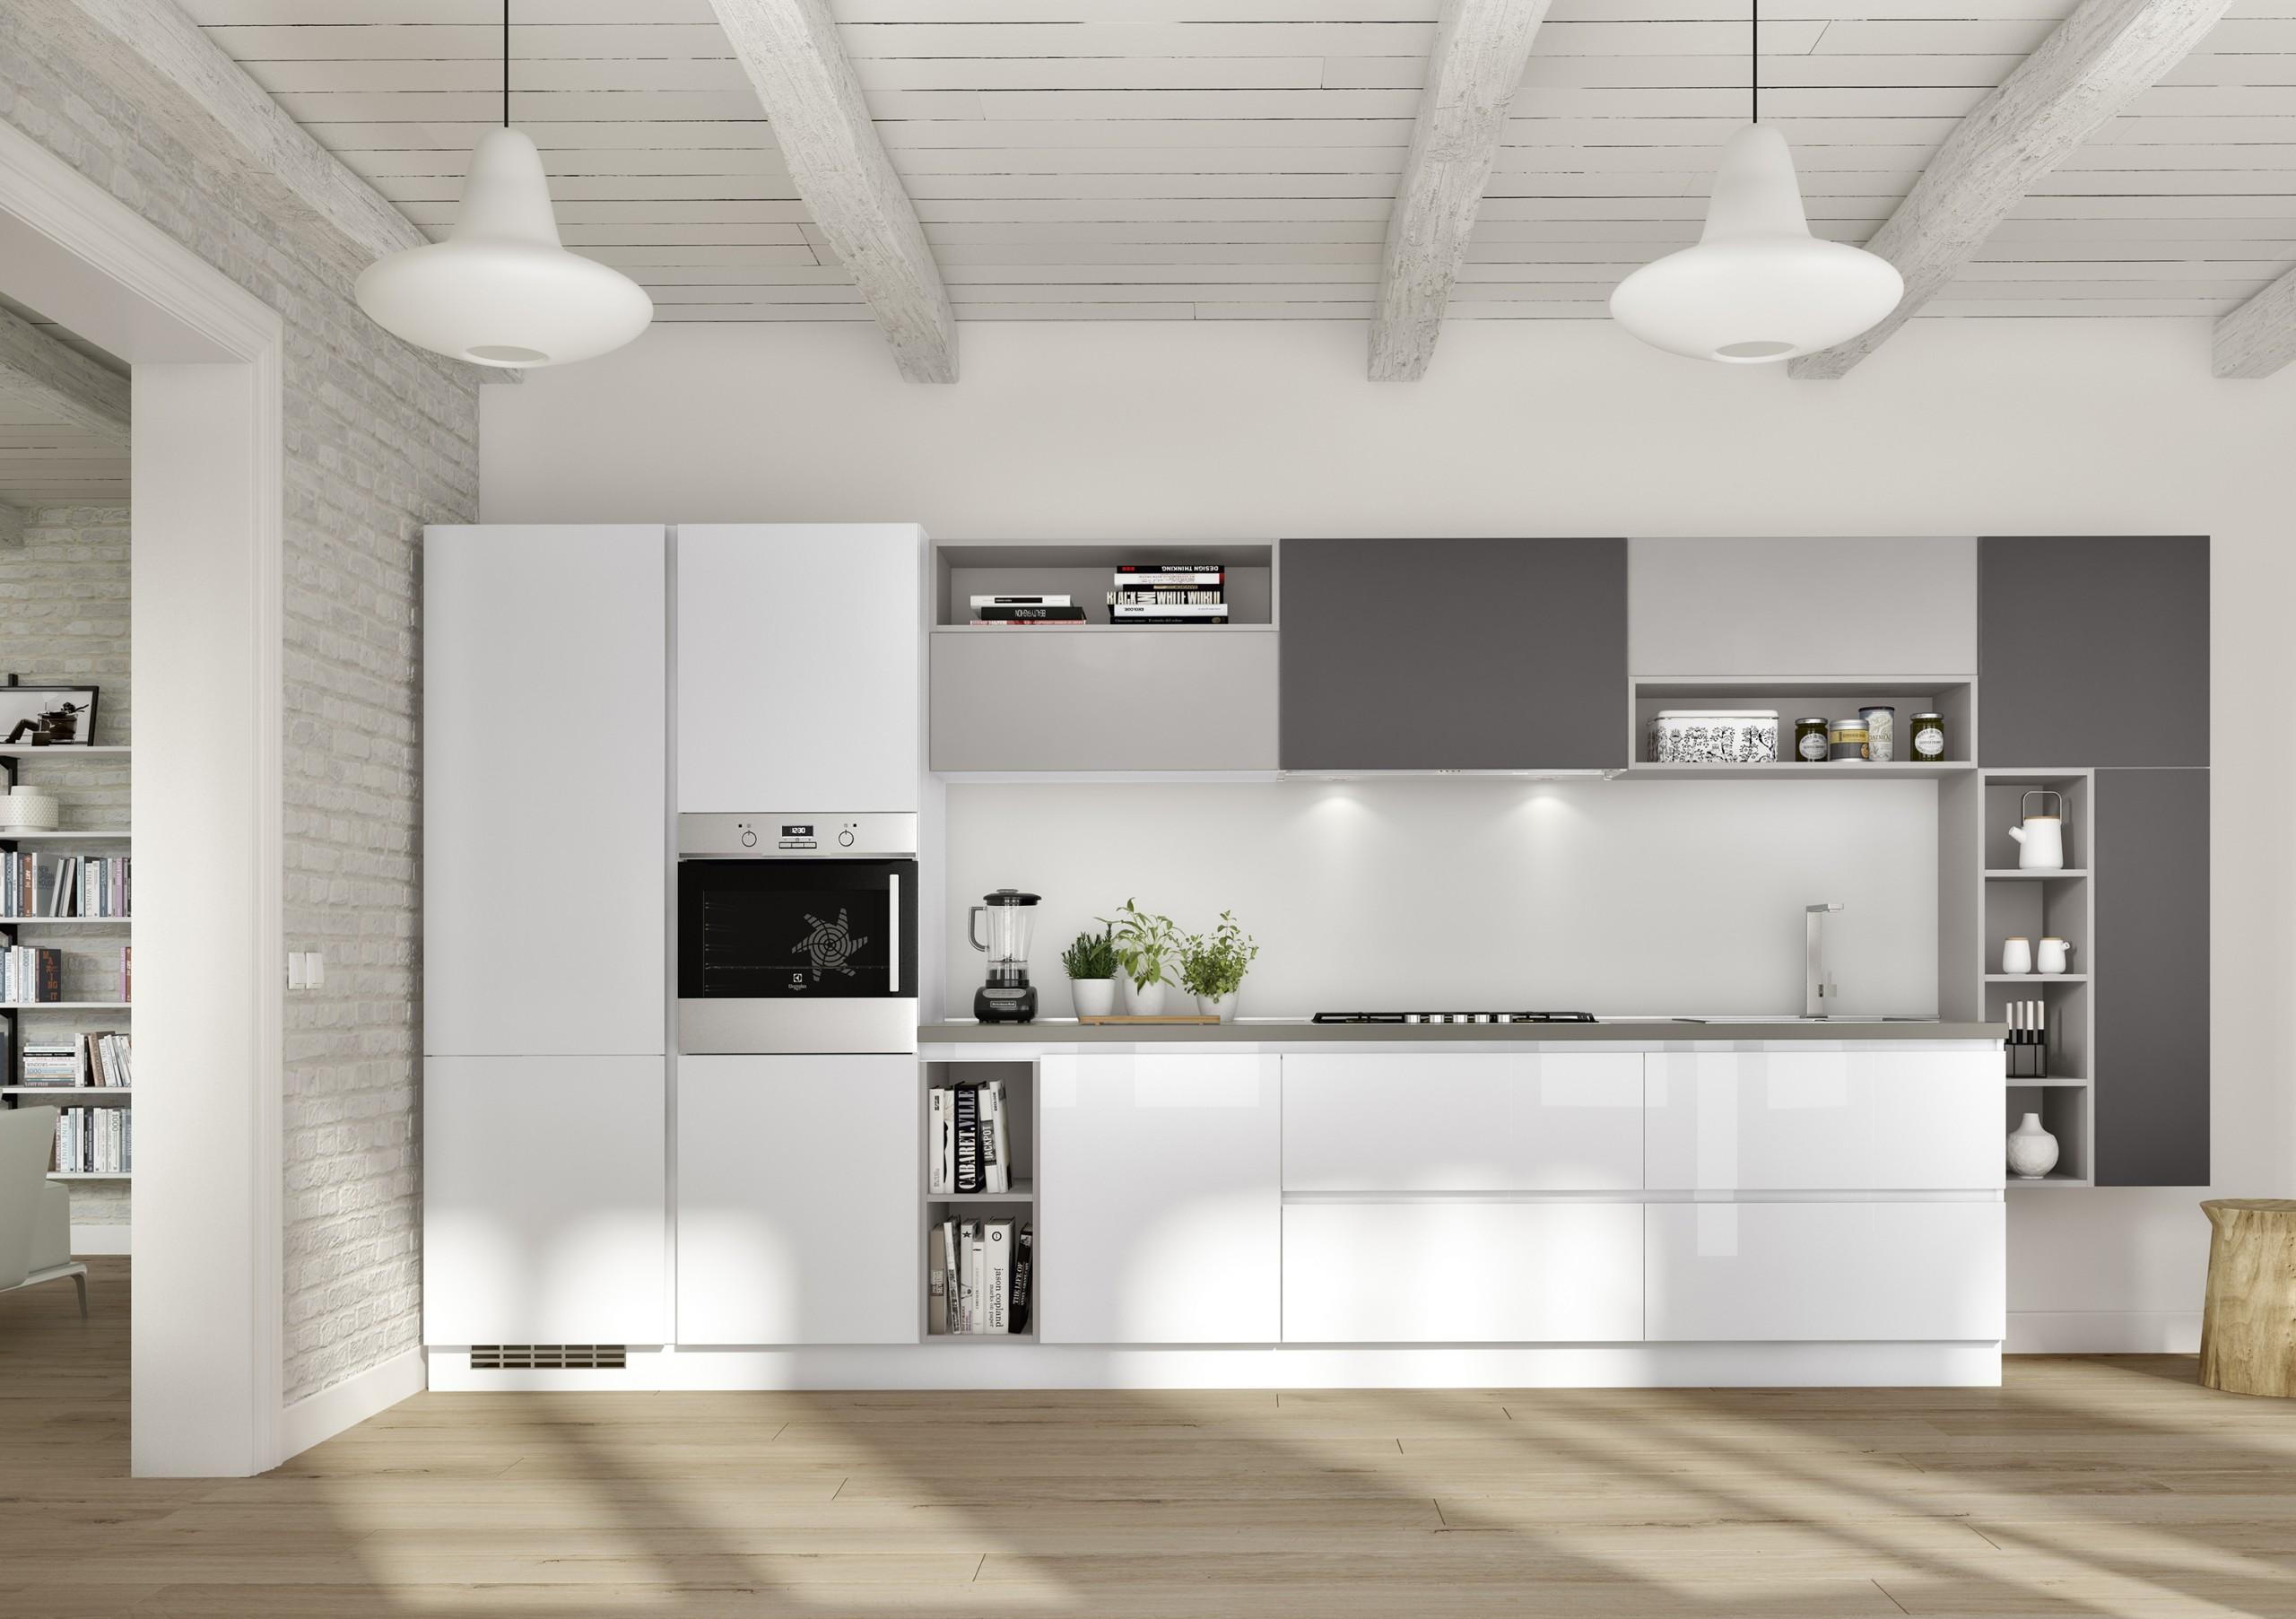 Cucina in sconto mod ravenna cucinenonsolo san marino - Prodotti ikea cucina ...